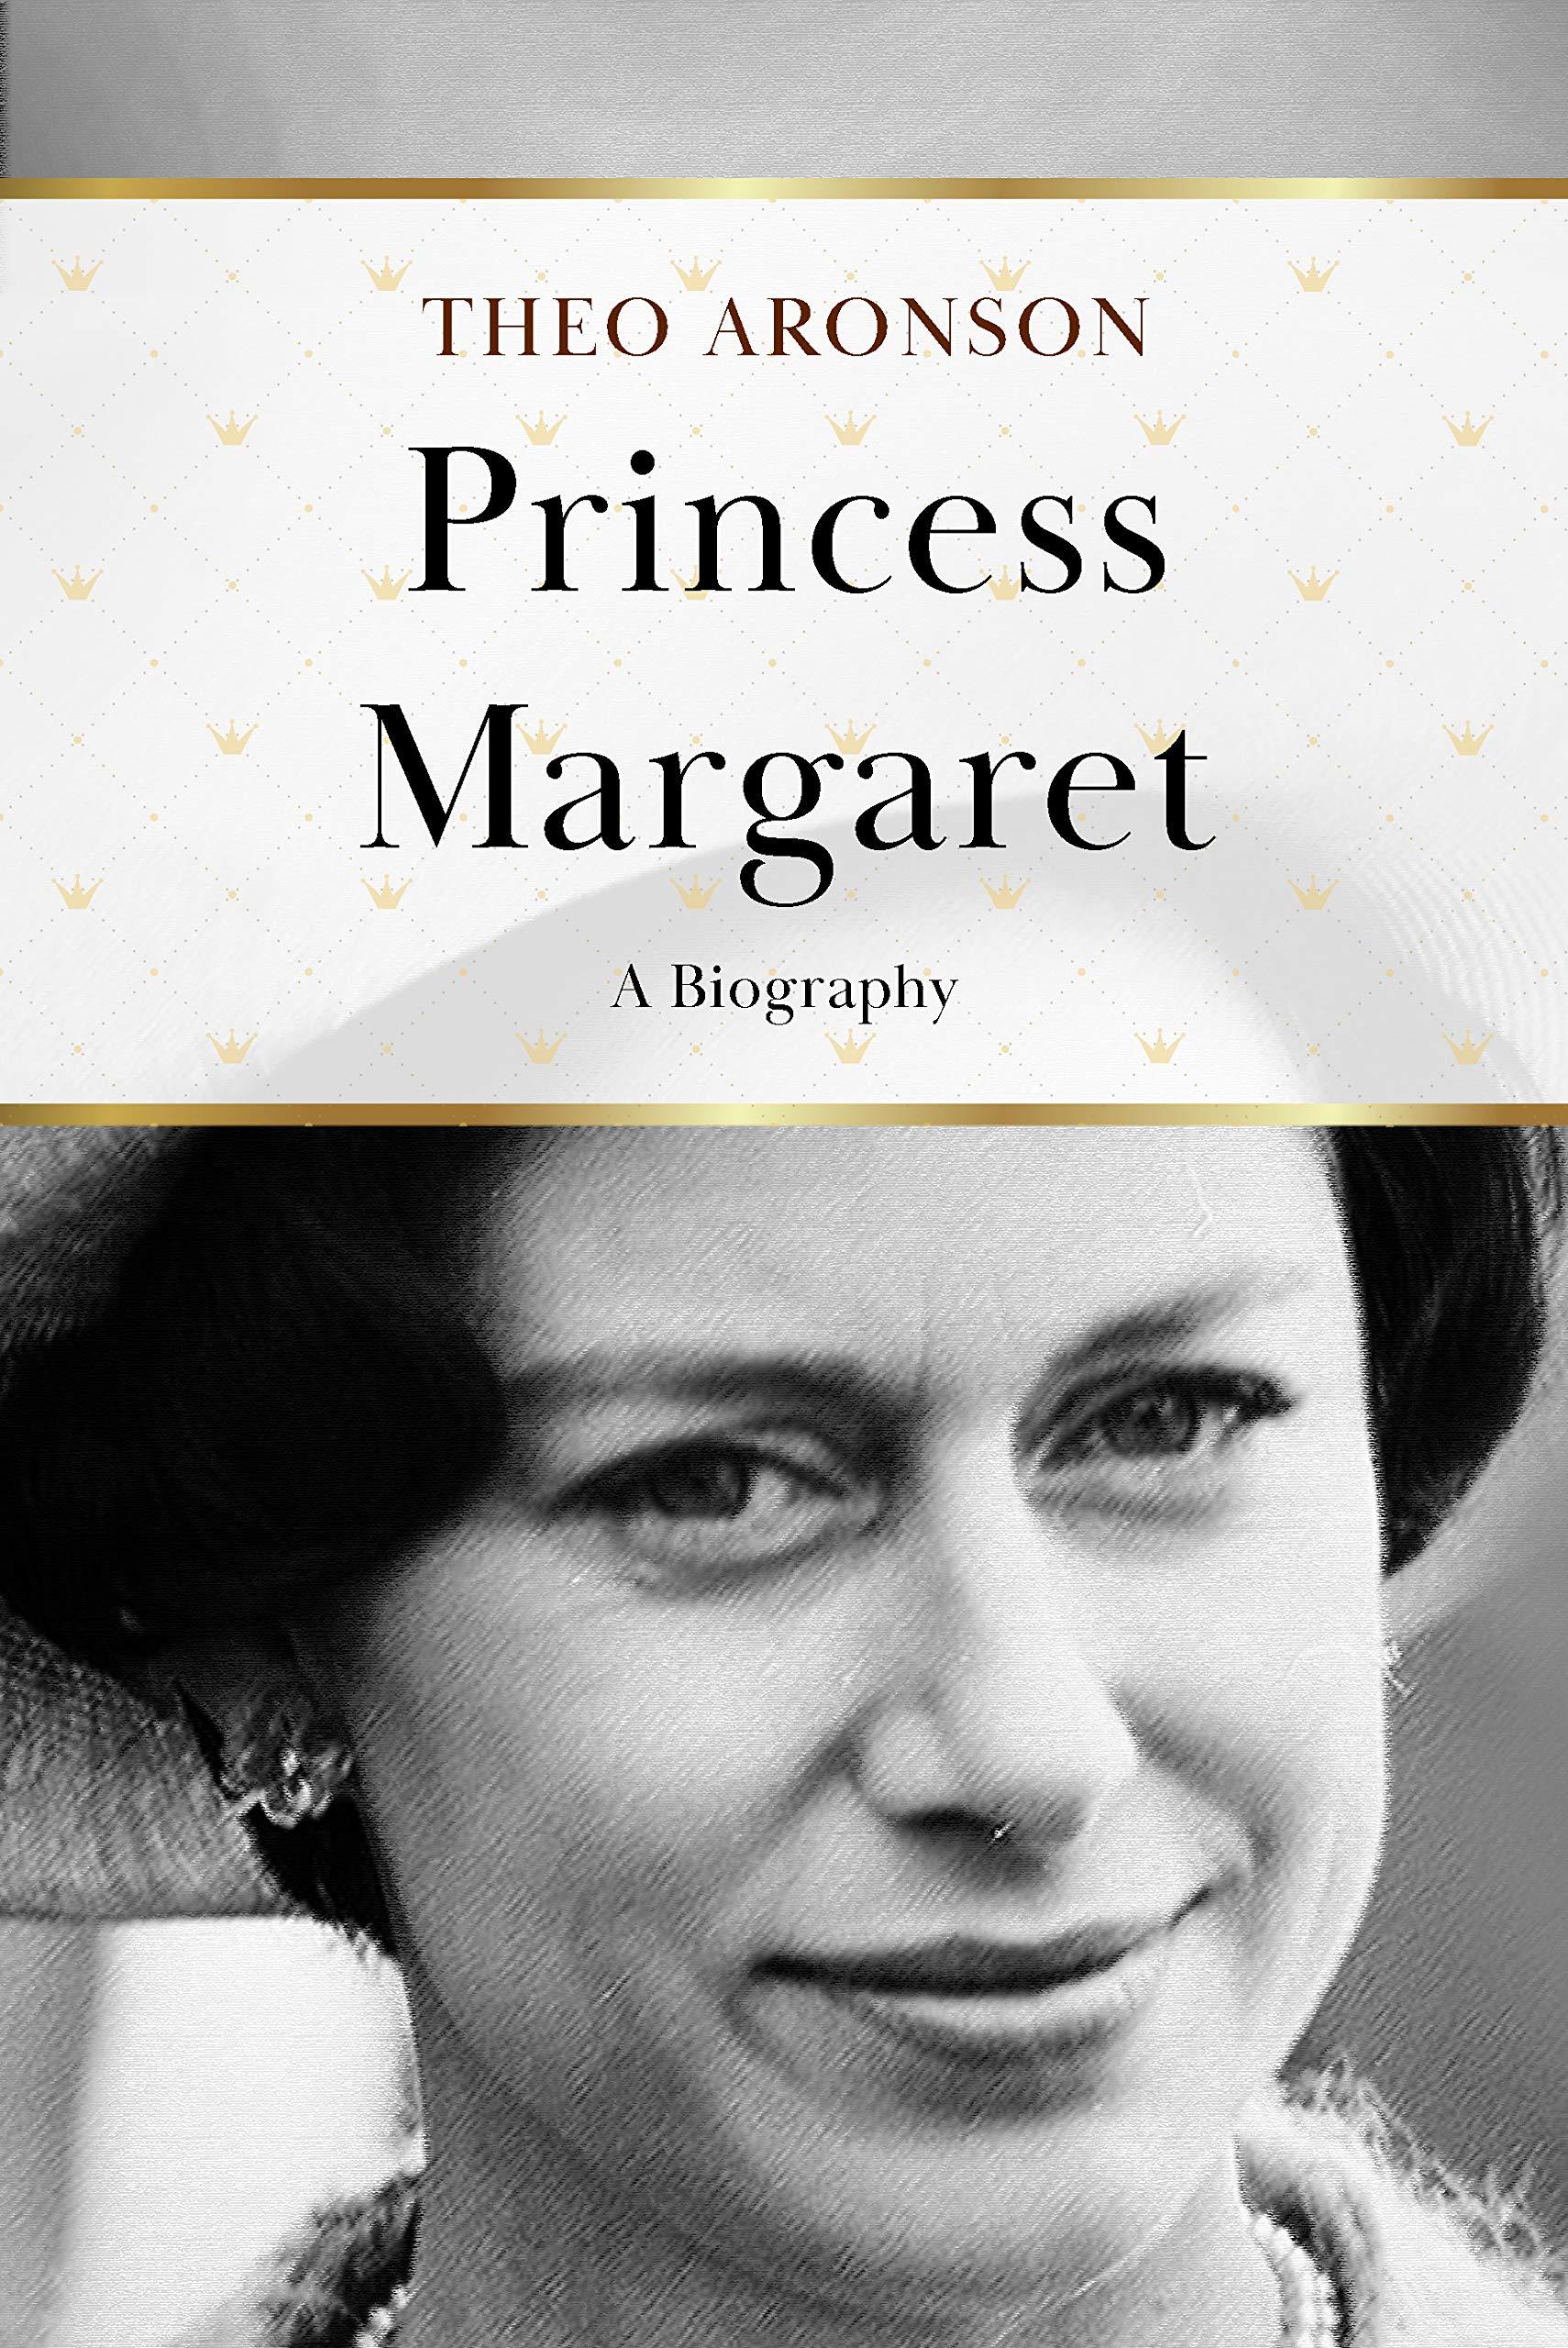 Princess Margaret: A Biography